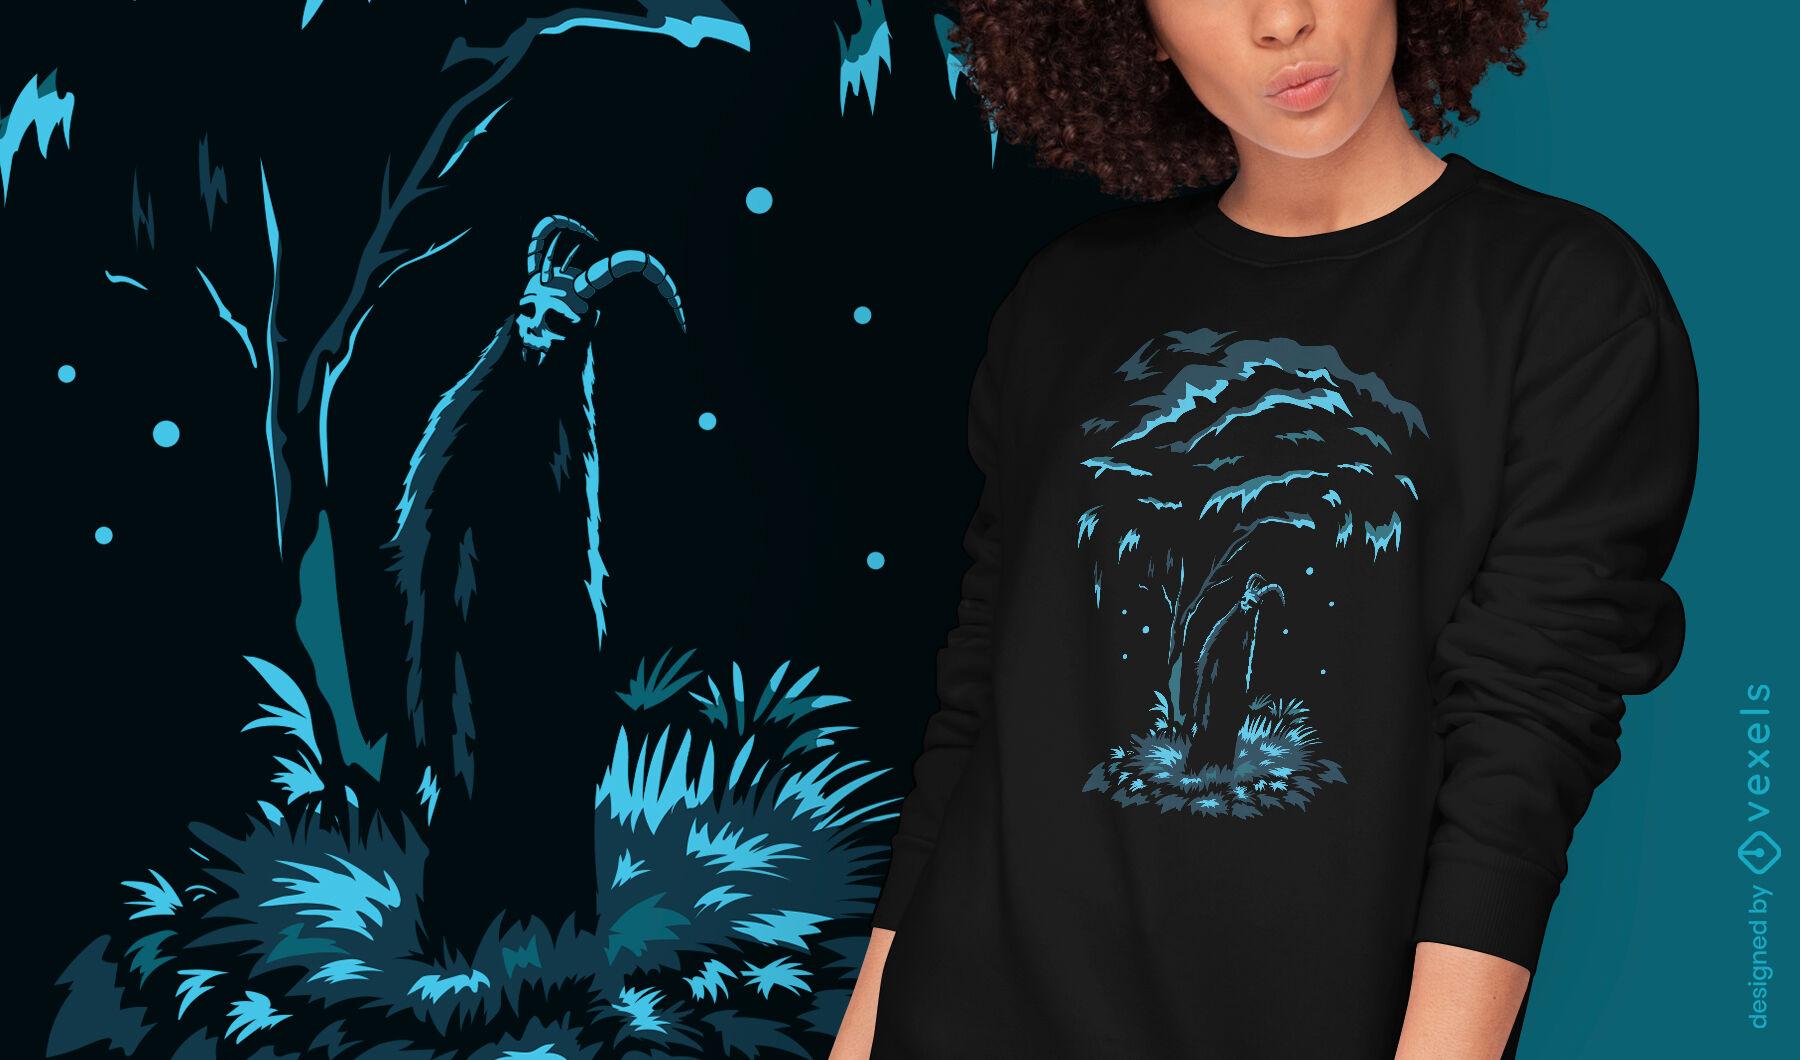 Diseño de camiseta de demonio de naturaleza de criatura oscura.